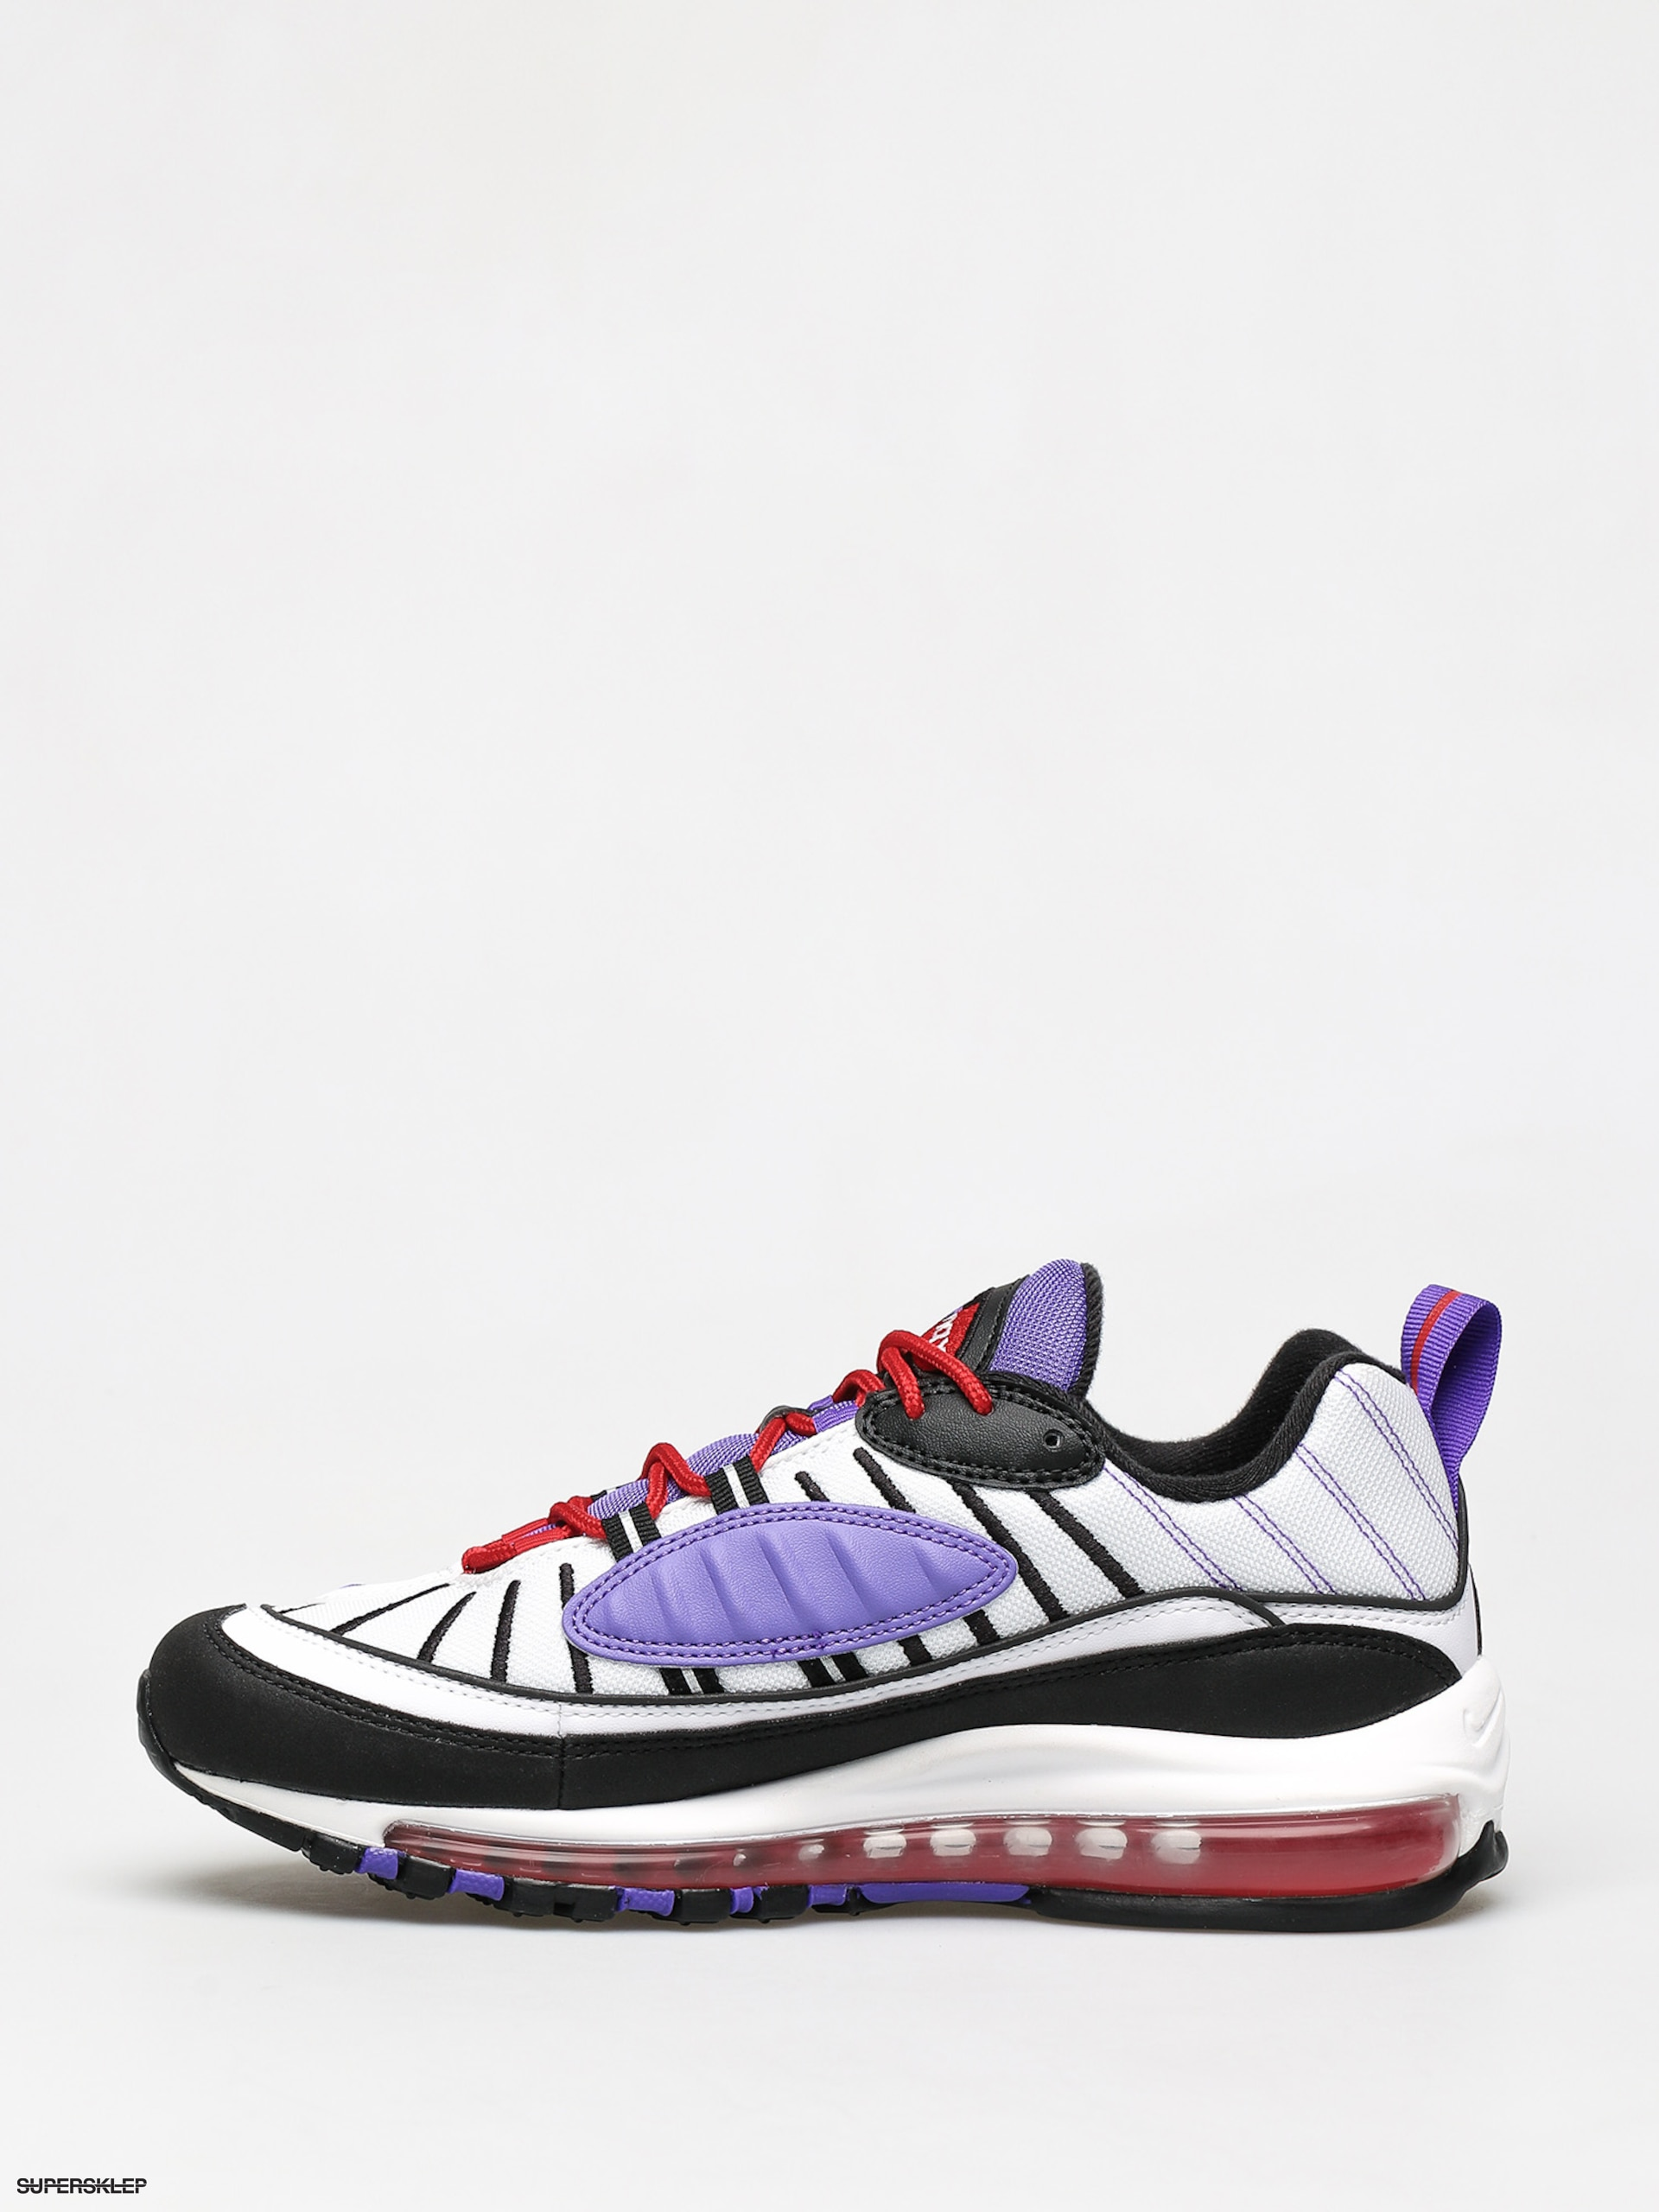 Air Max 97 Sneaker In Black White Psychic Purple